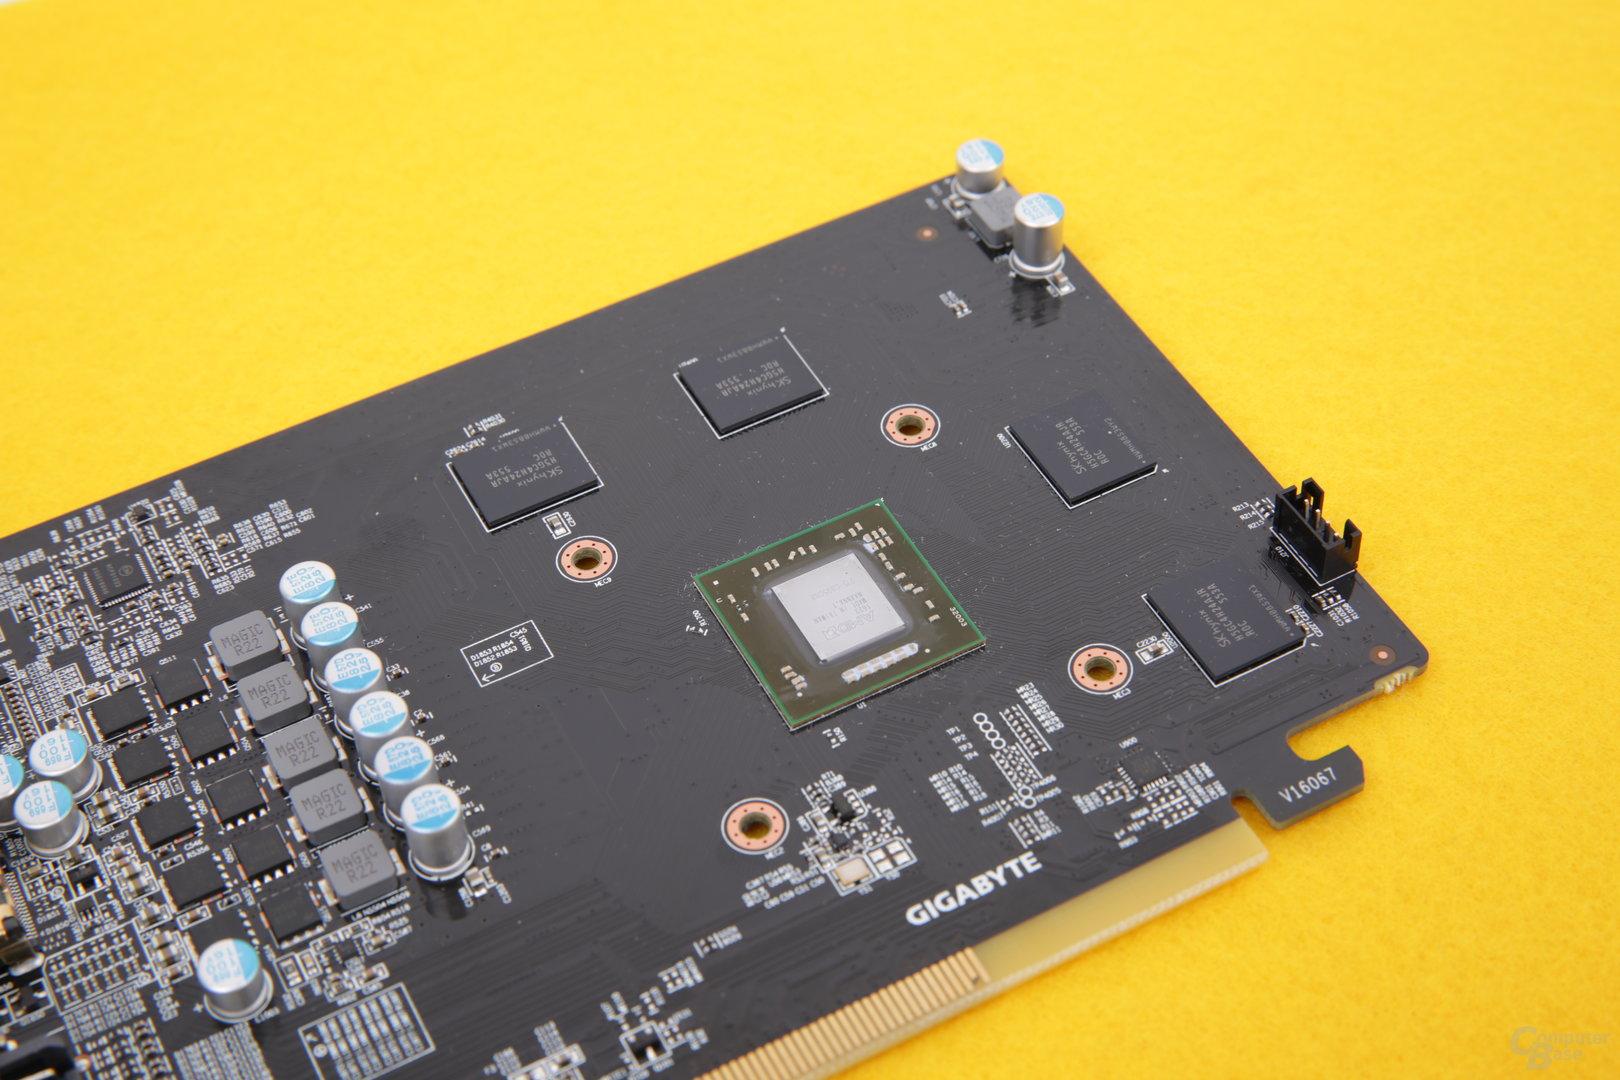 Gigabyte RX 460 – Kühler abmontiert